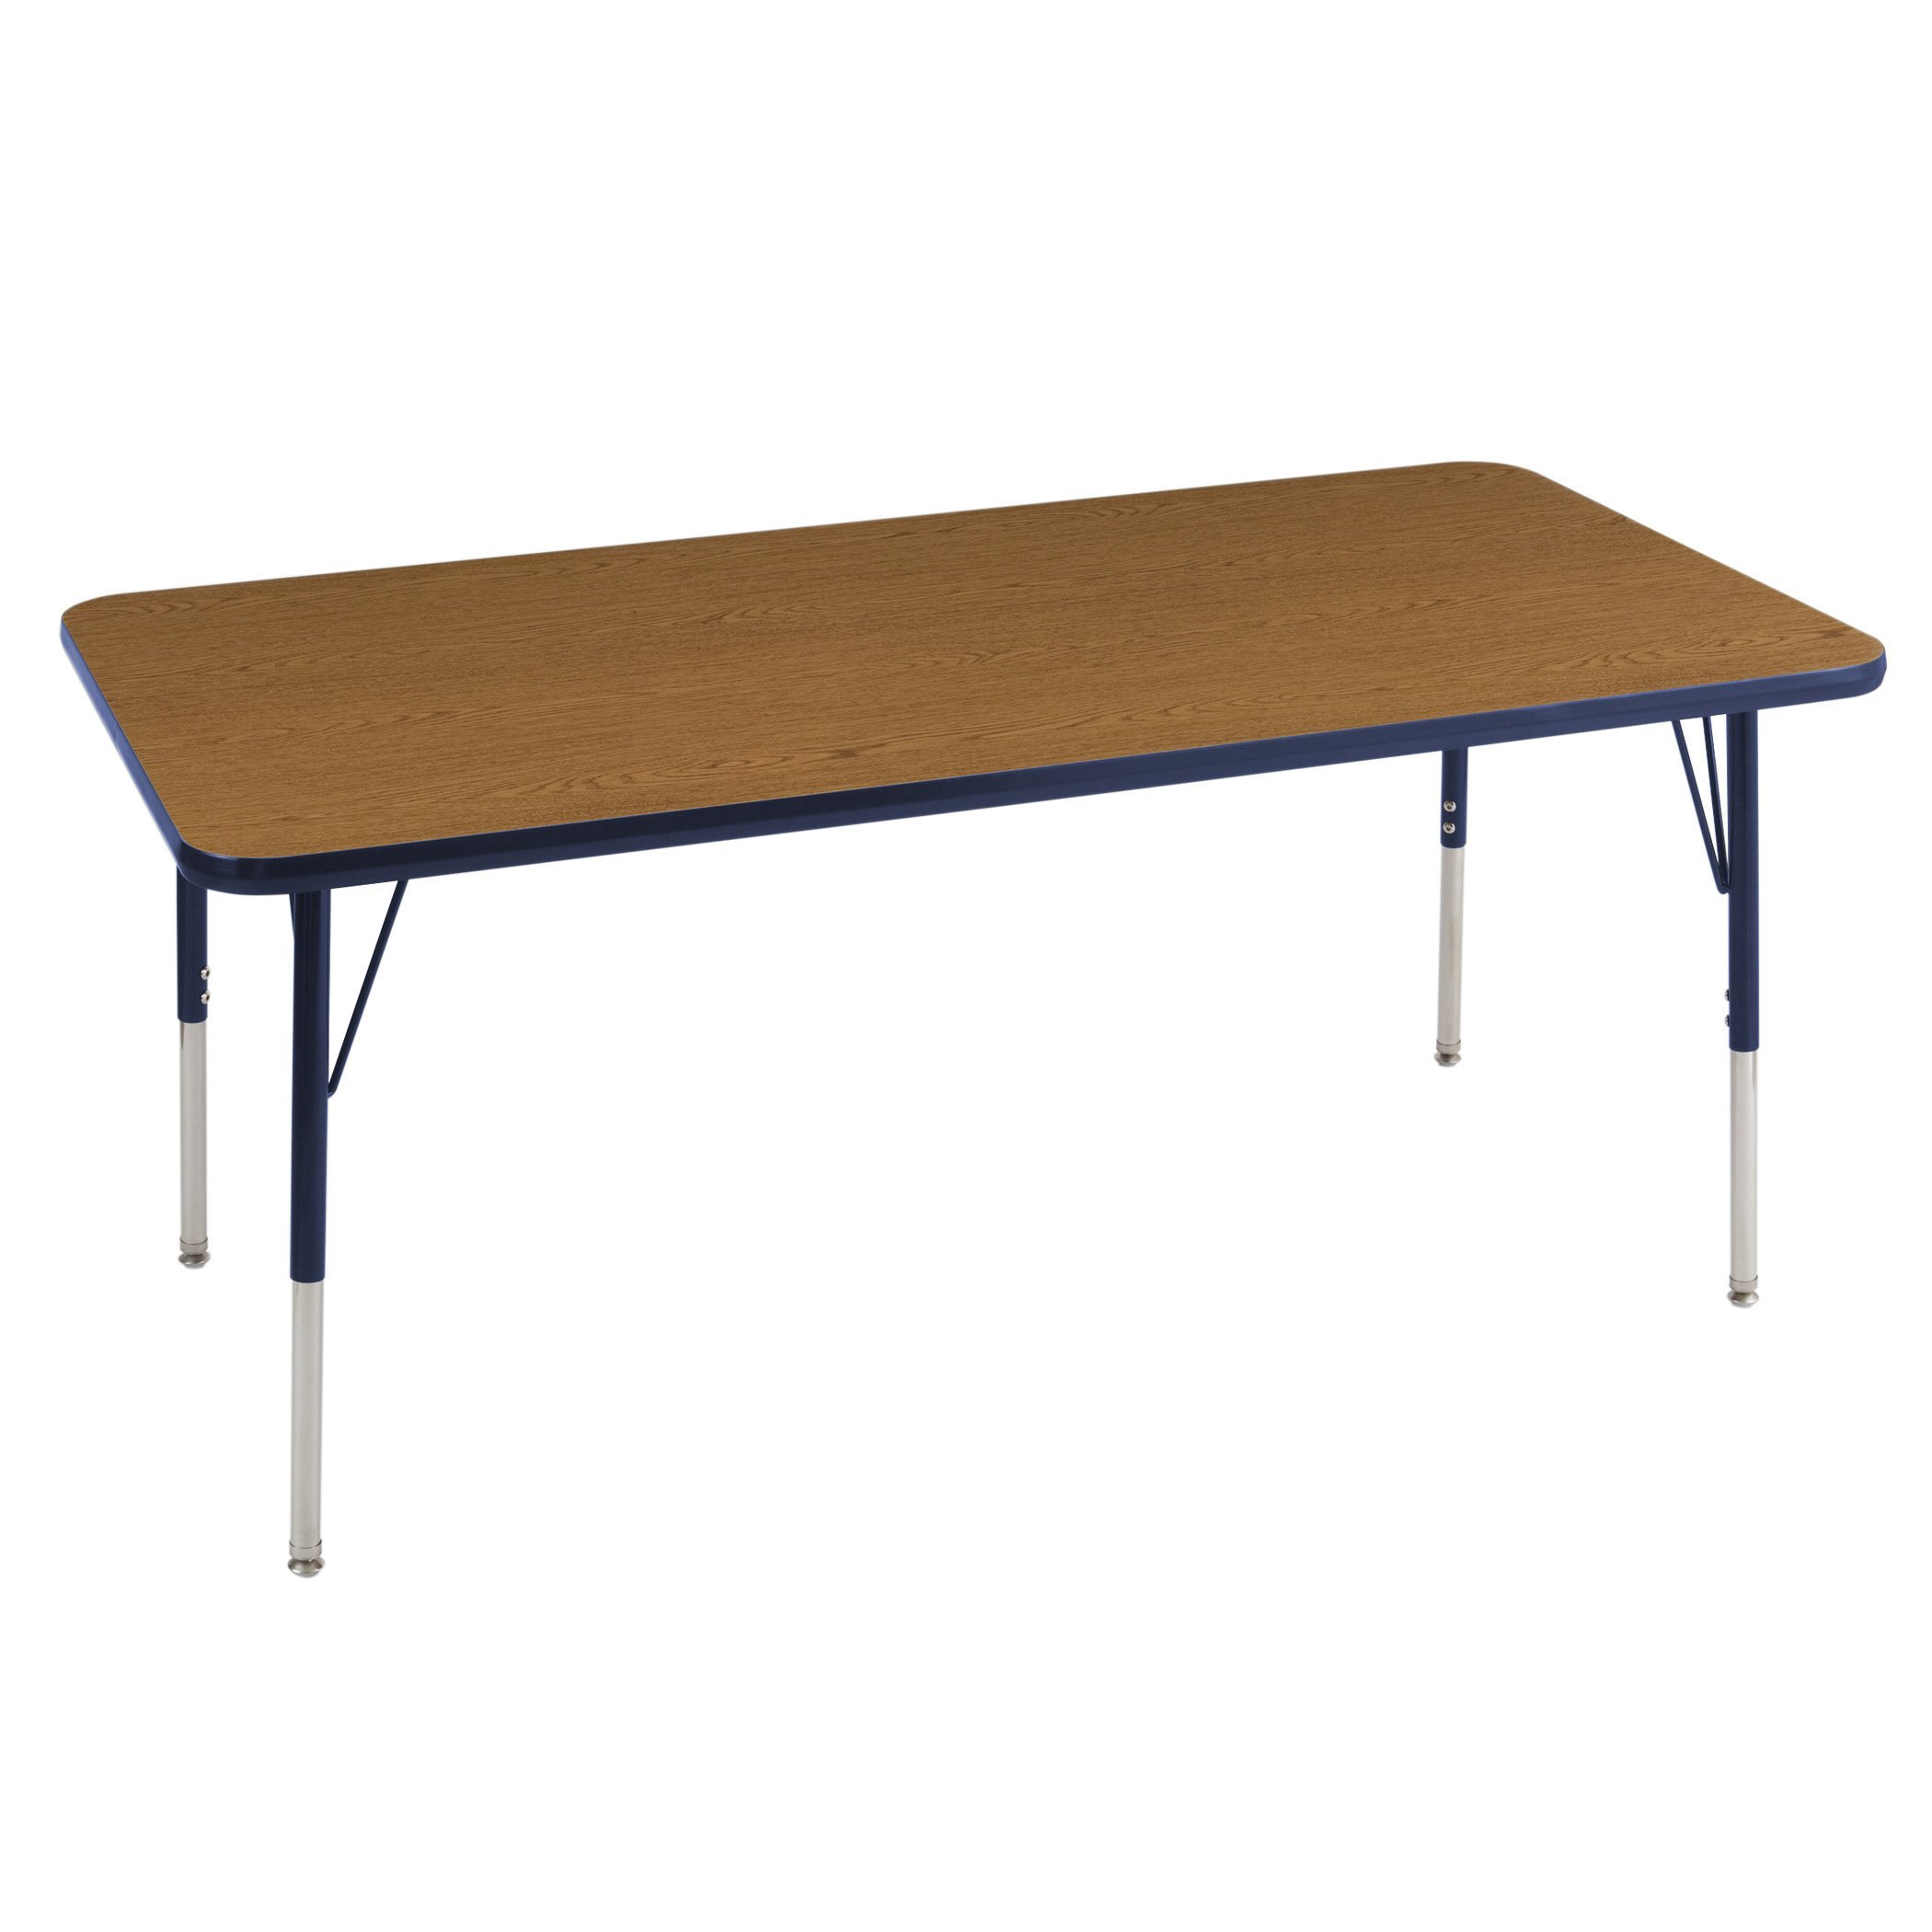 ECR4Kids Mesa Thermo-fused 30'' x 60'' Rectangular School Activity Table, Standard Legs w/ Swivel Glides, Adjustable Height 19-30 inch (Oak/Navy)